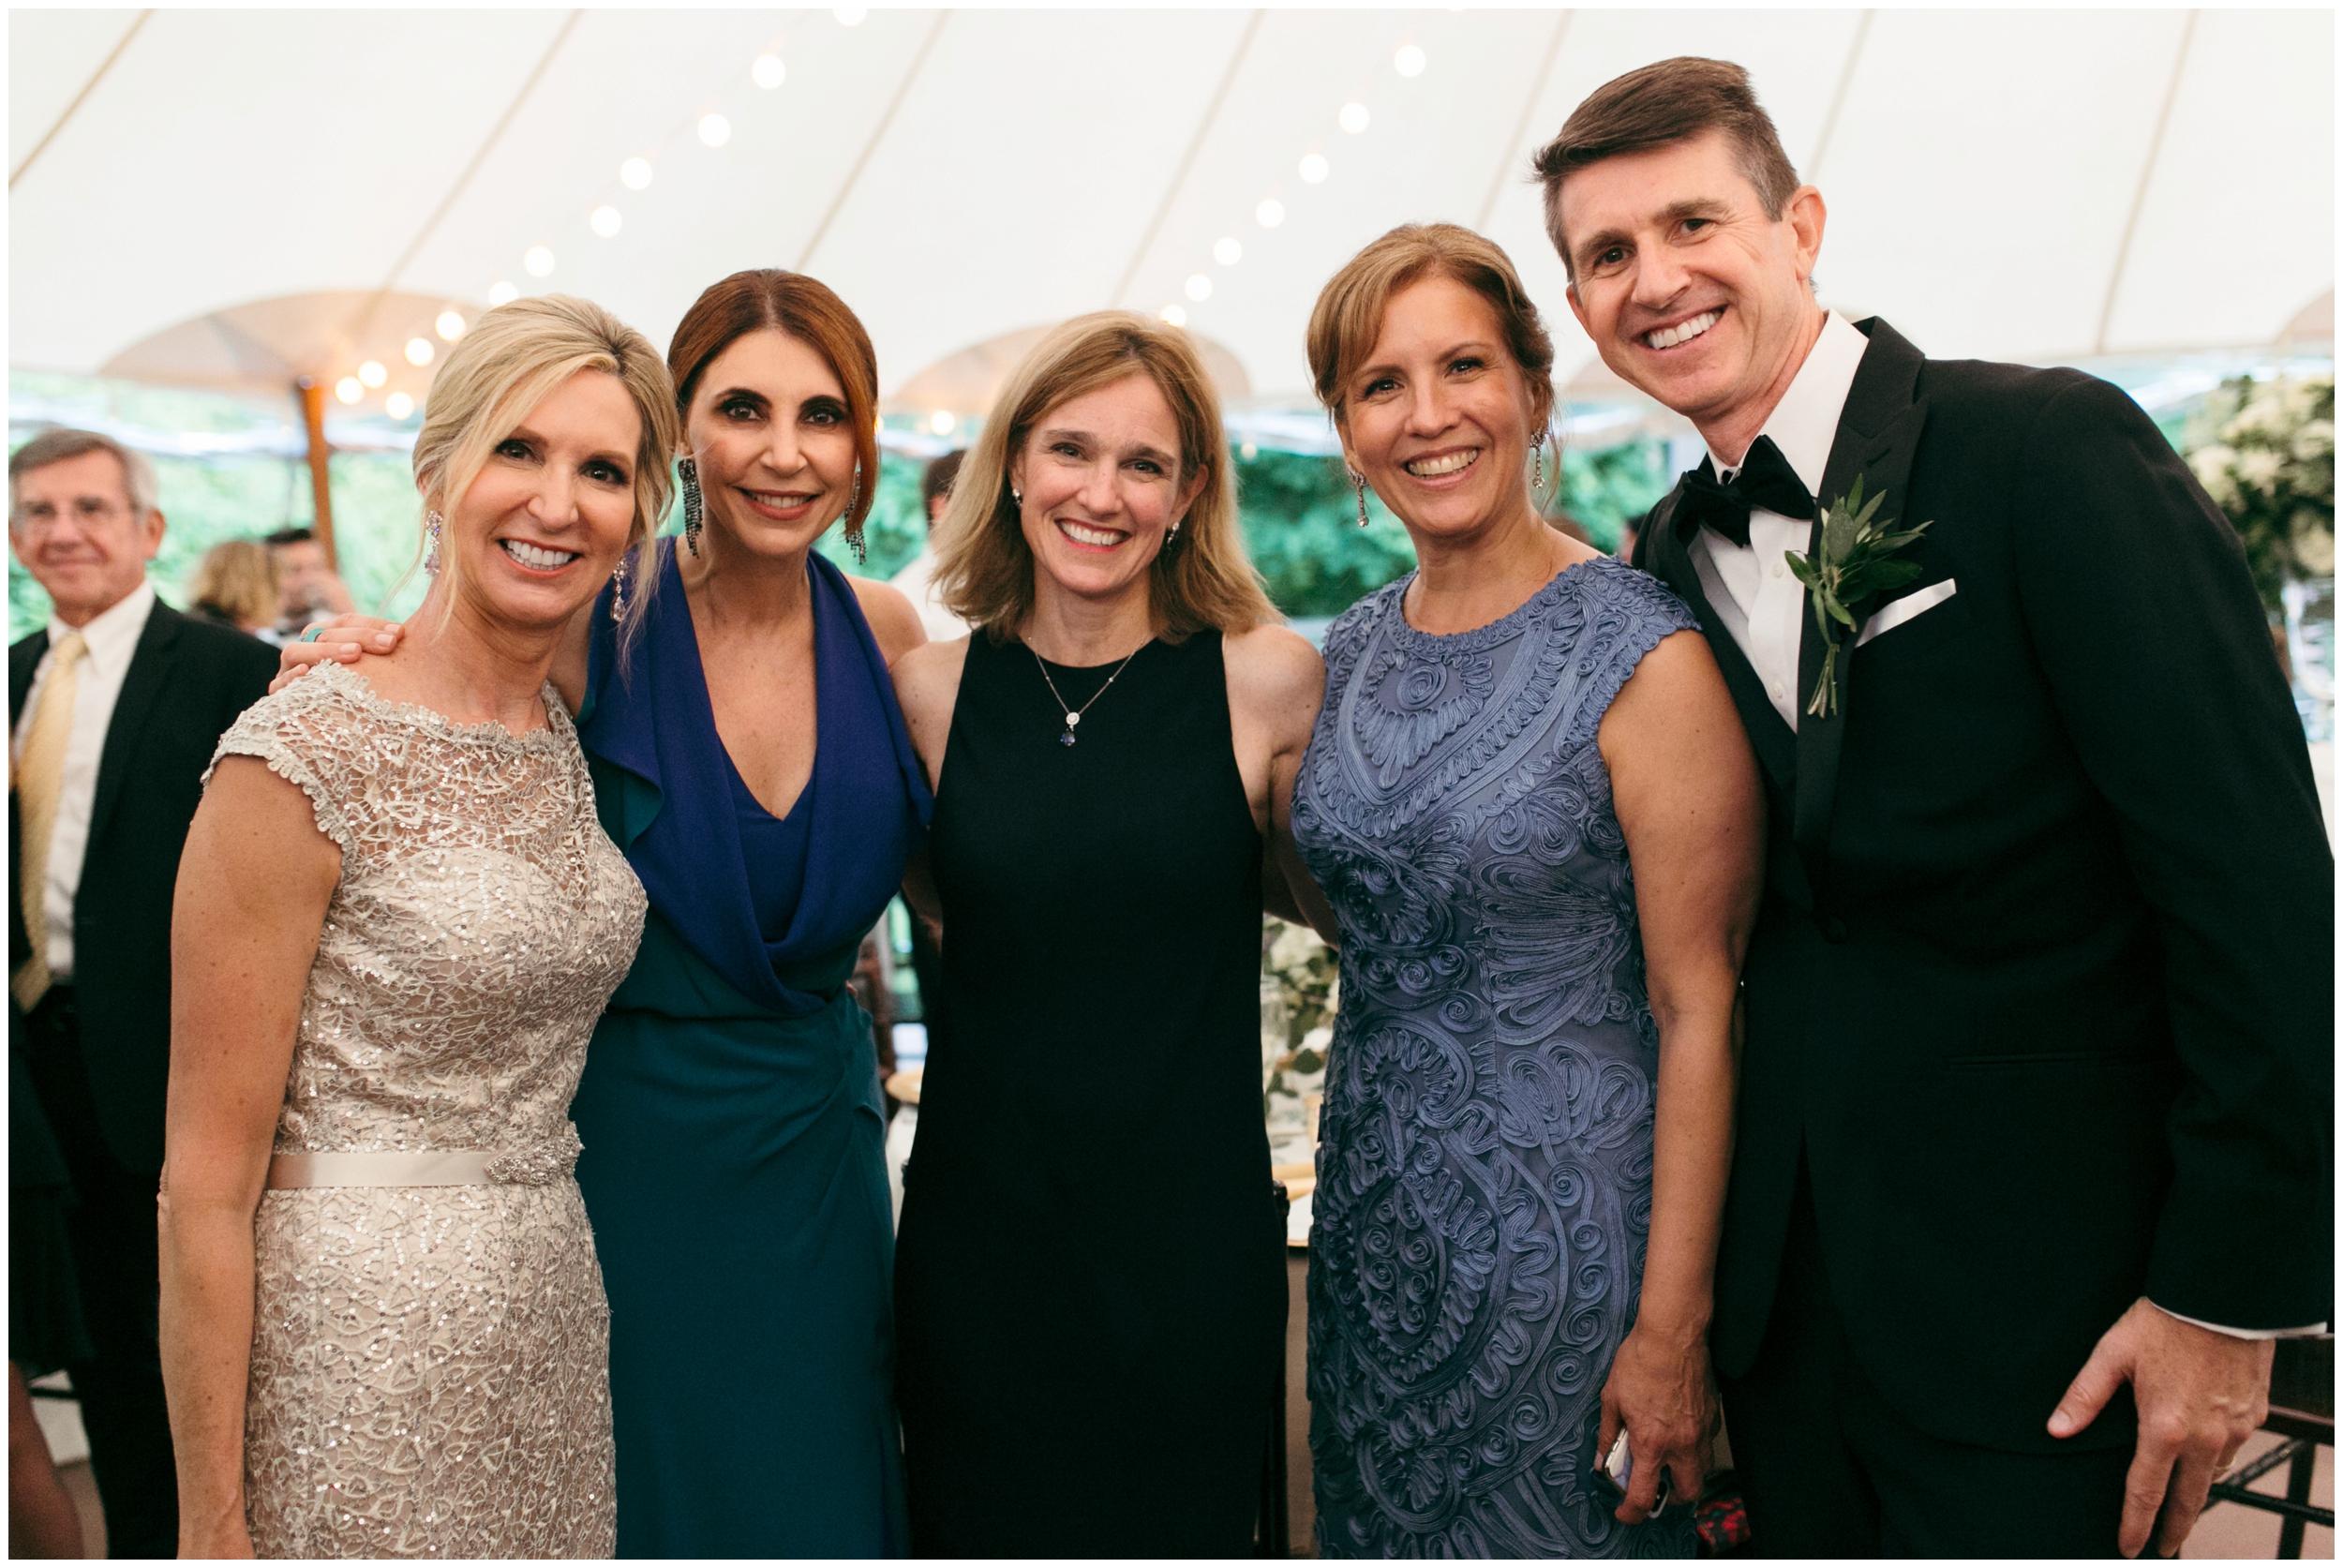 Willowdale-Estate-Wedding-Bailey-Q-Photo-Boston-Wedding-Photographer-092.JPG